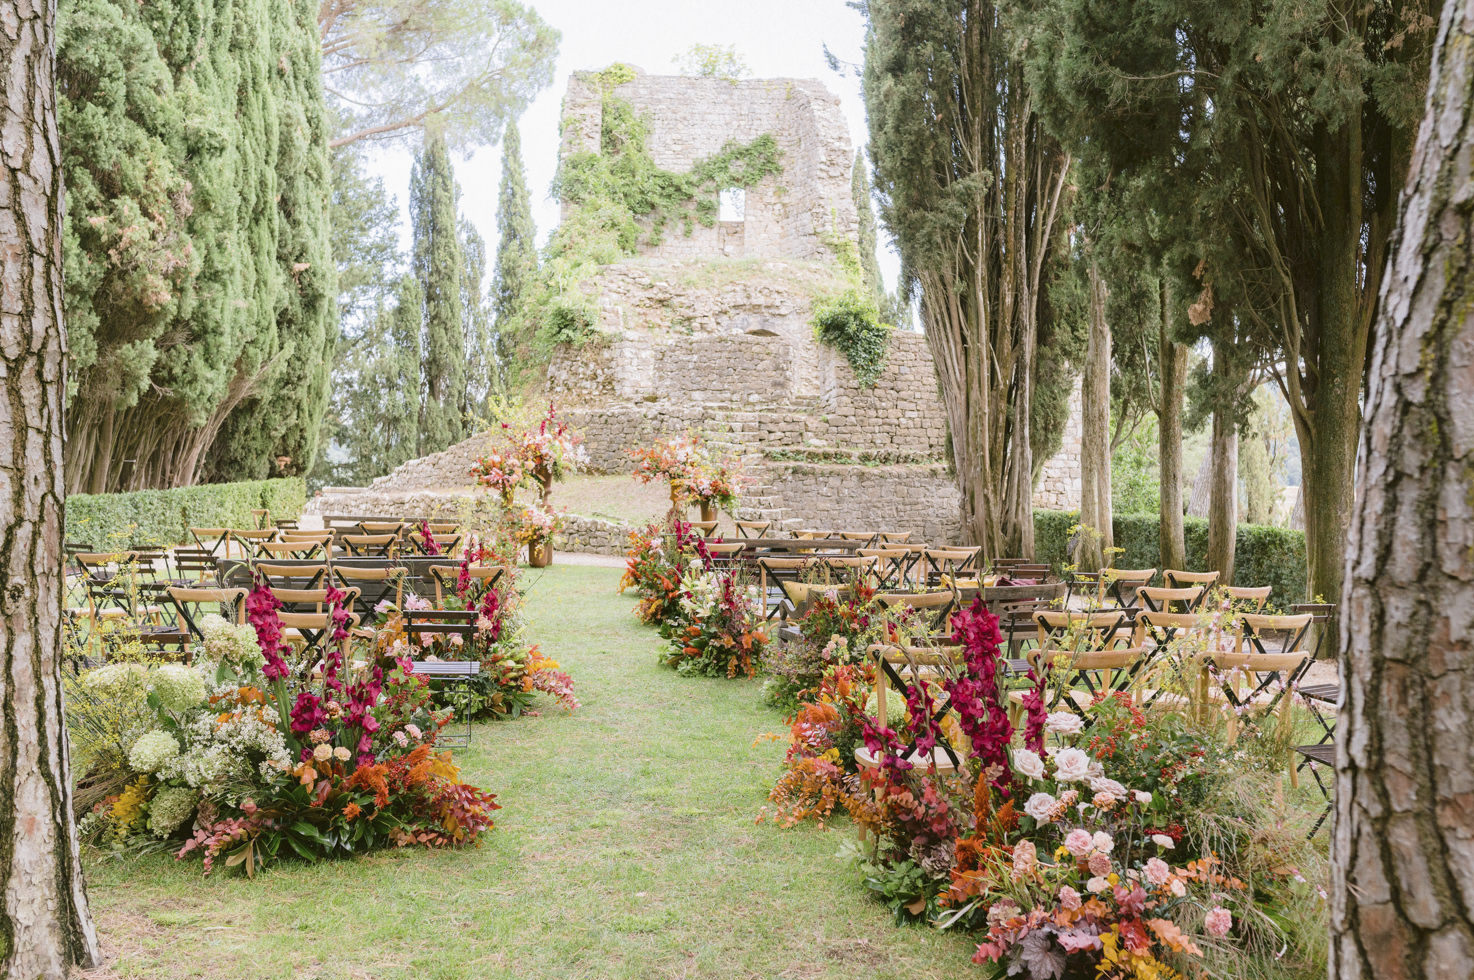 Flowers for wedding ceremony in Tuscany Castiglion del Bosco